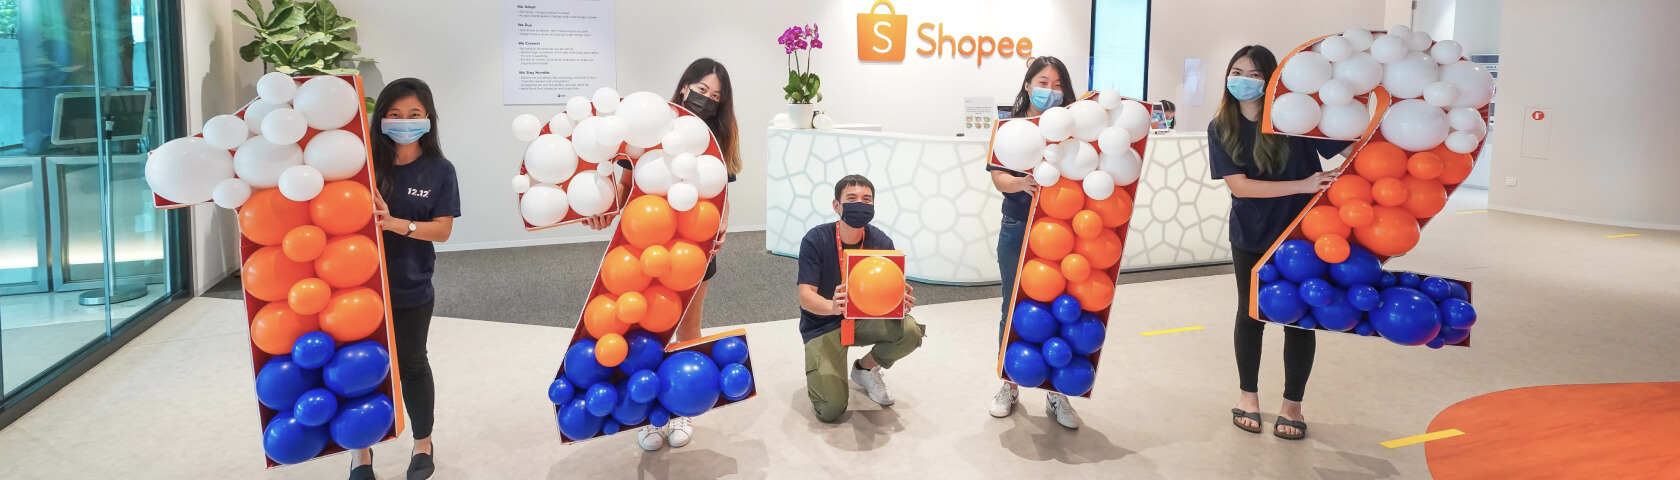 Karir di Shopee   Bergabunglah Bersama Kami   Shopee Indonesia